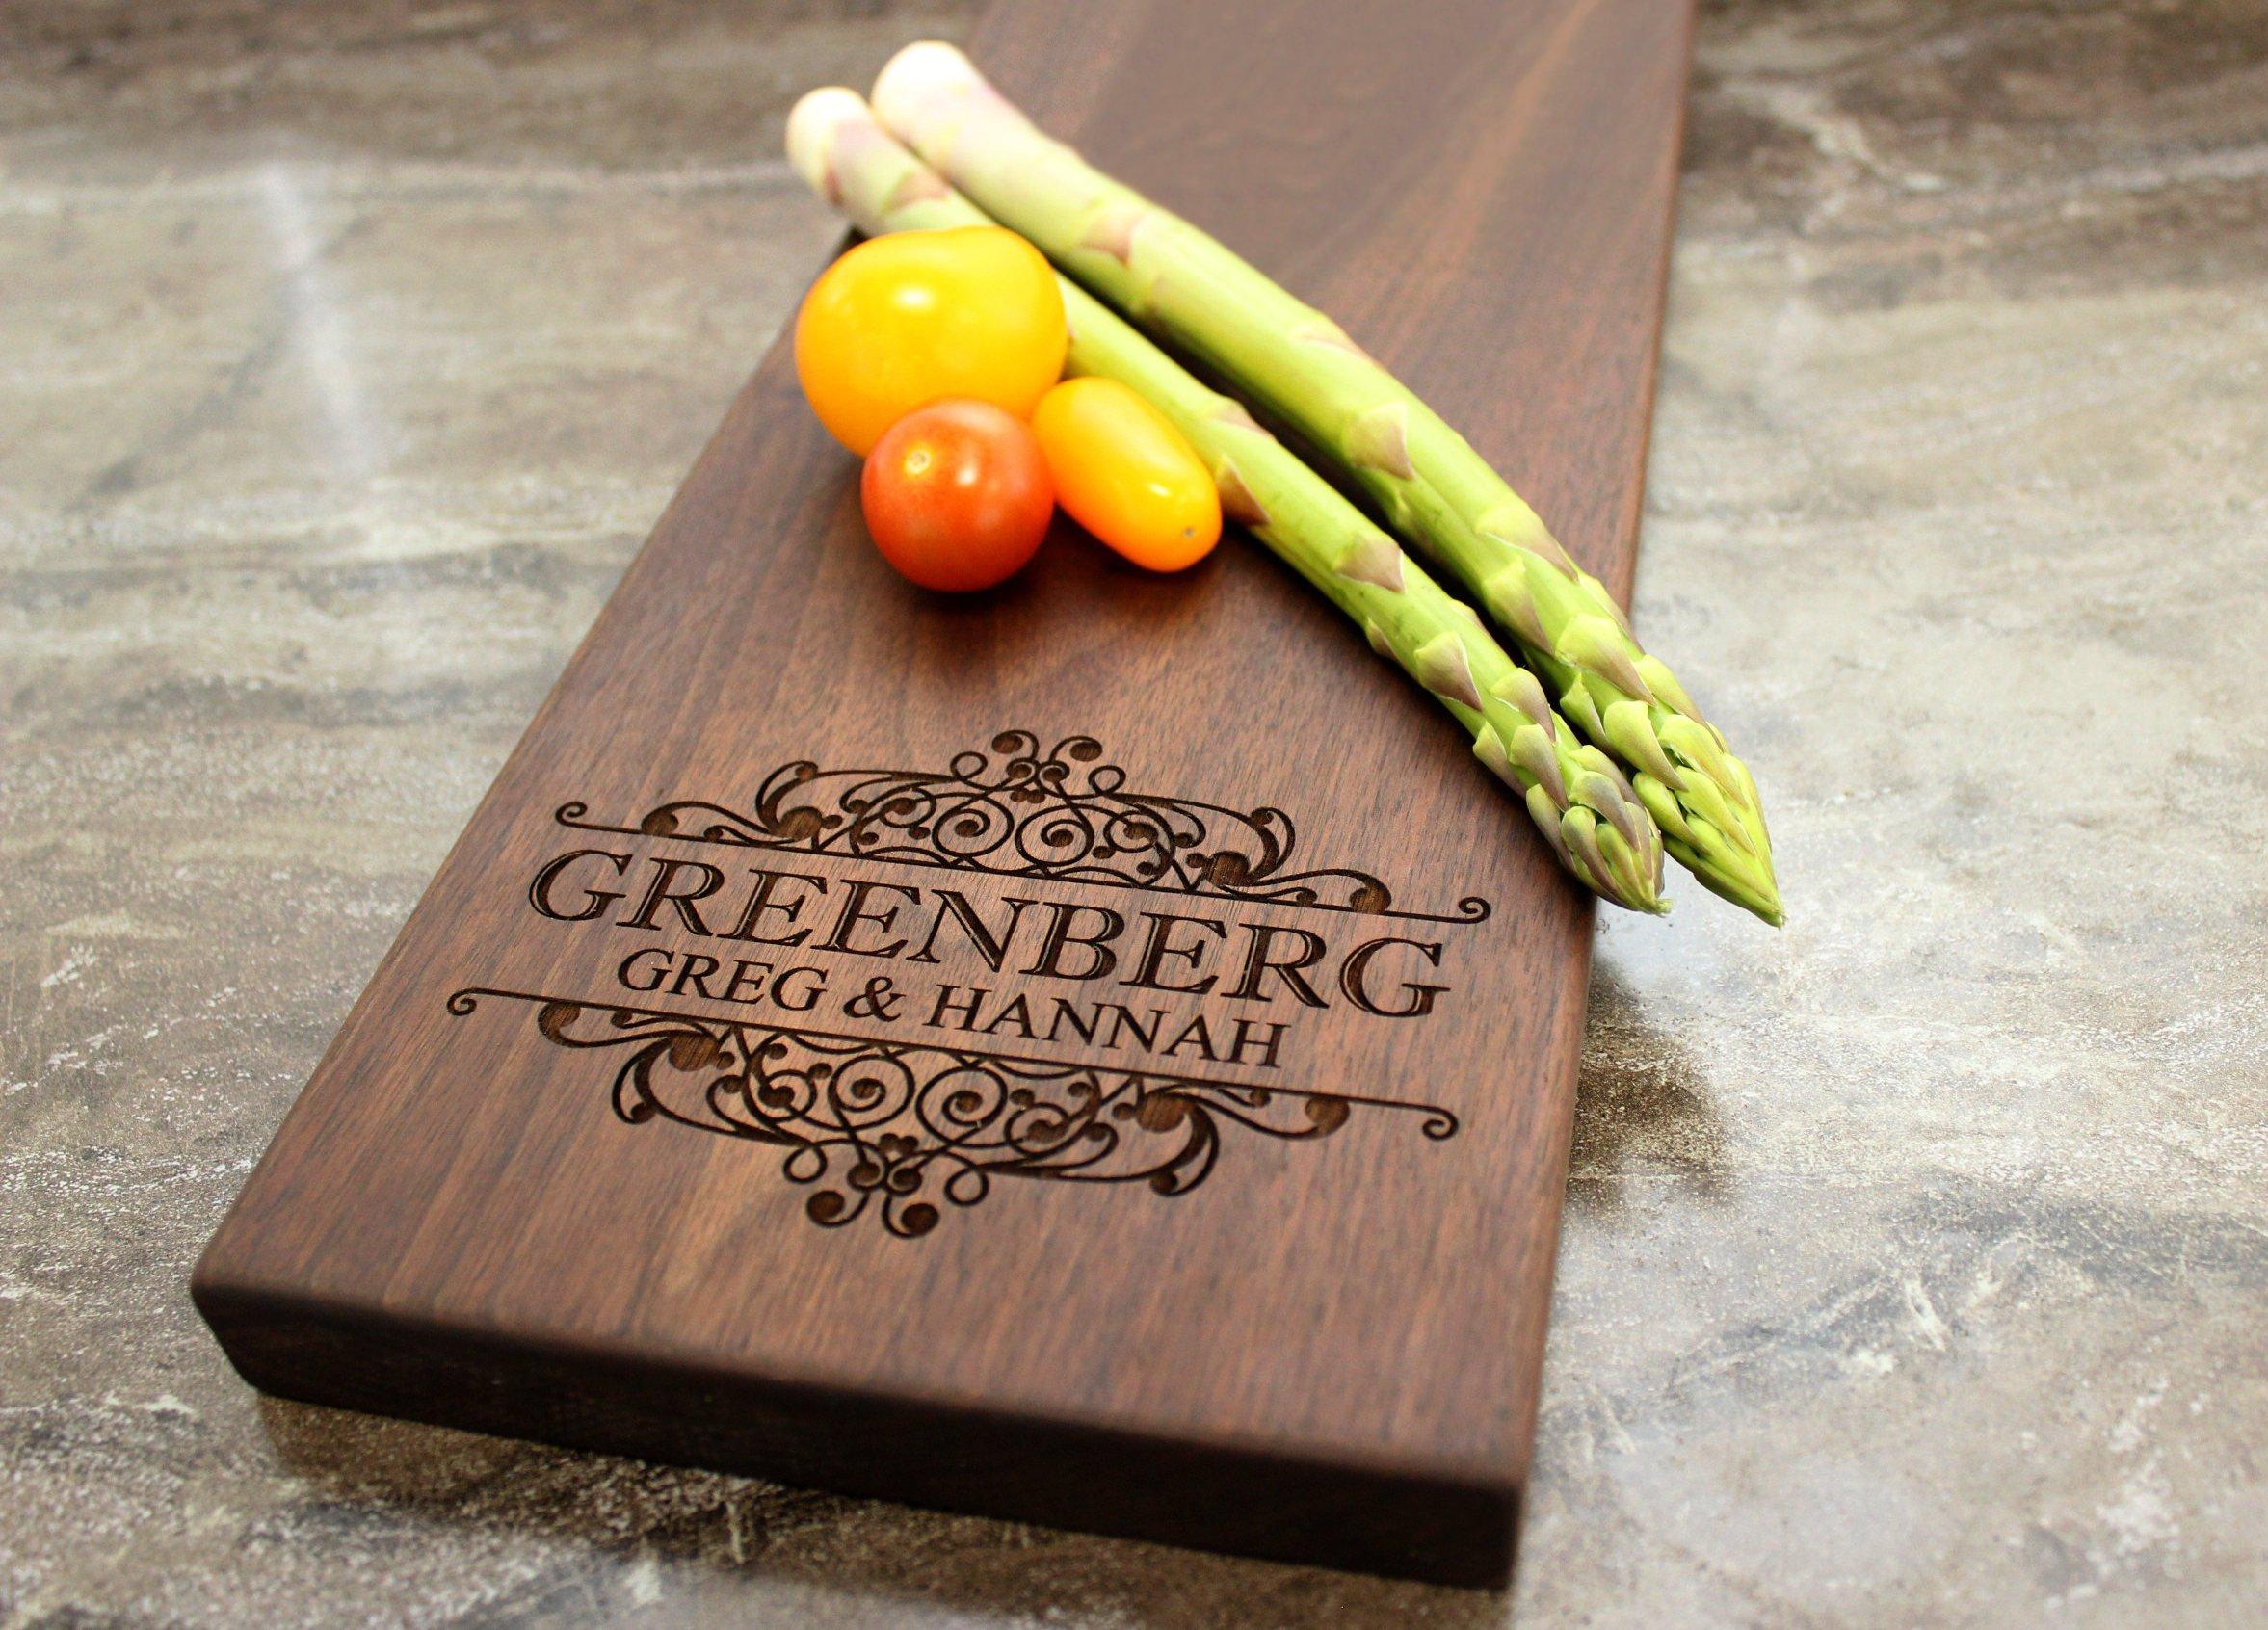 31 Wedding Anniversary Gift: Personalized Cheese Board, Serving Board, Bread Board